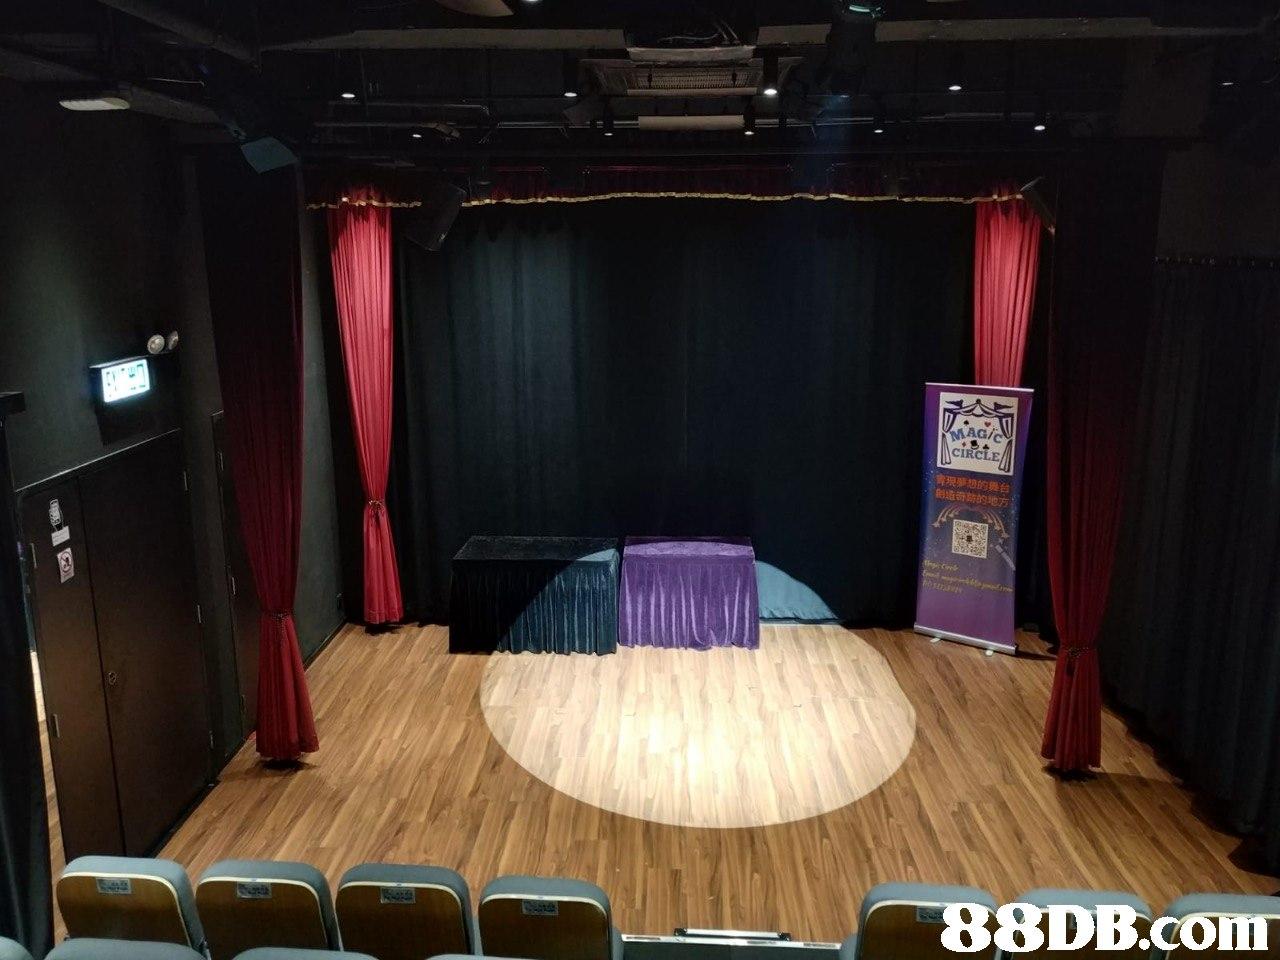 CIRCLE 現夢想的異台 刽造奇跡的地方 8DB.com  stage,entertainment,room,theatre,auditorium